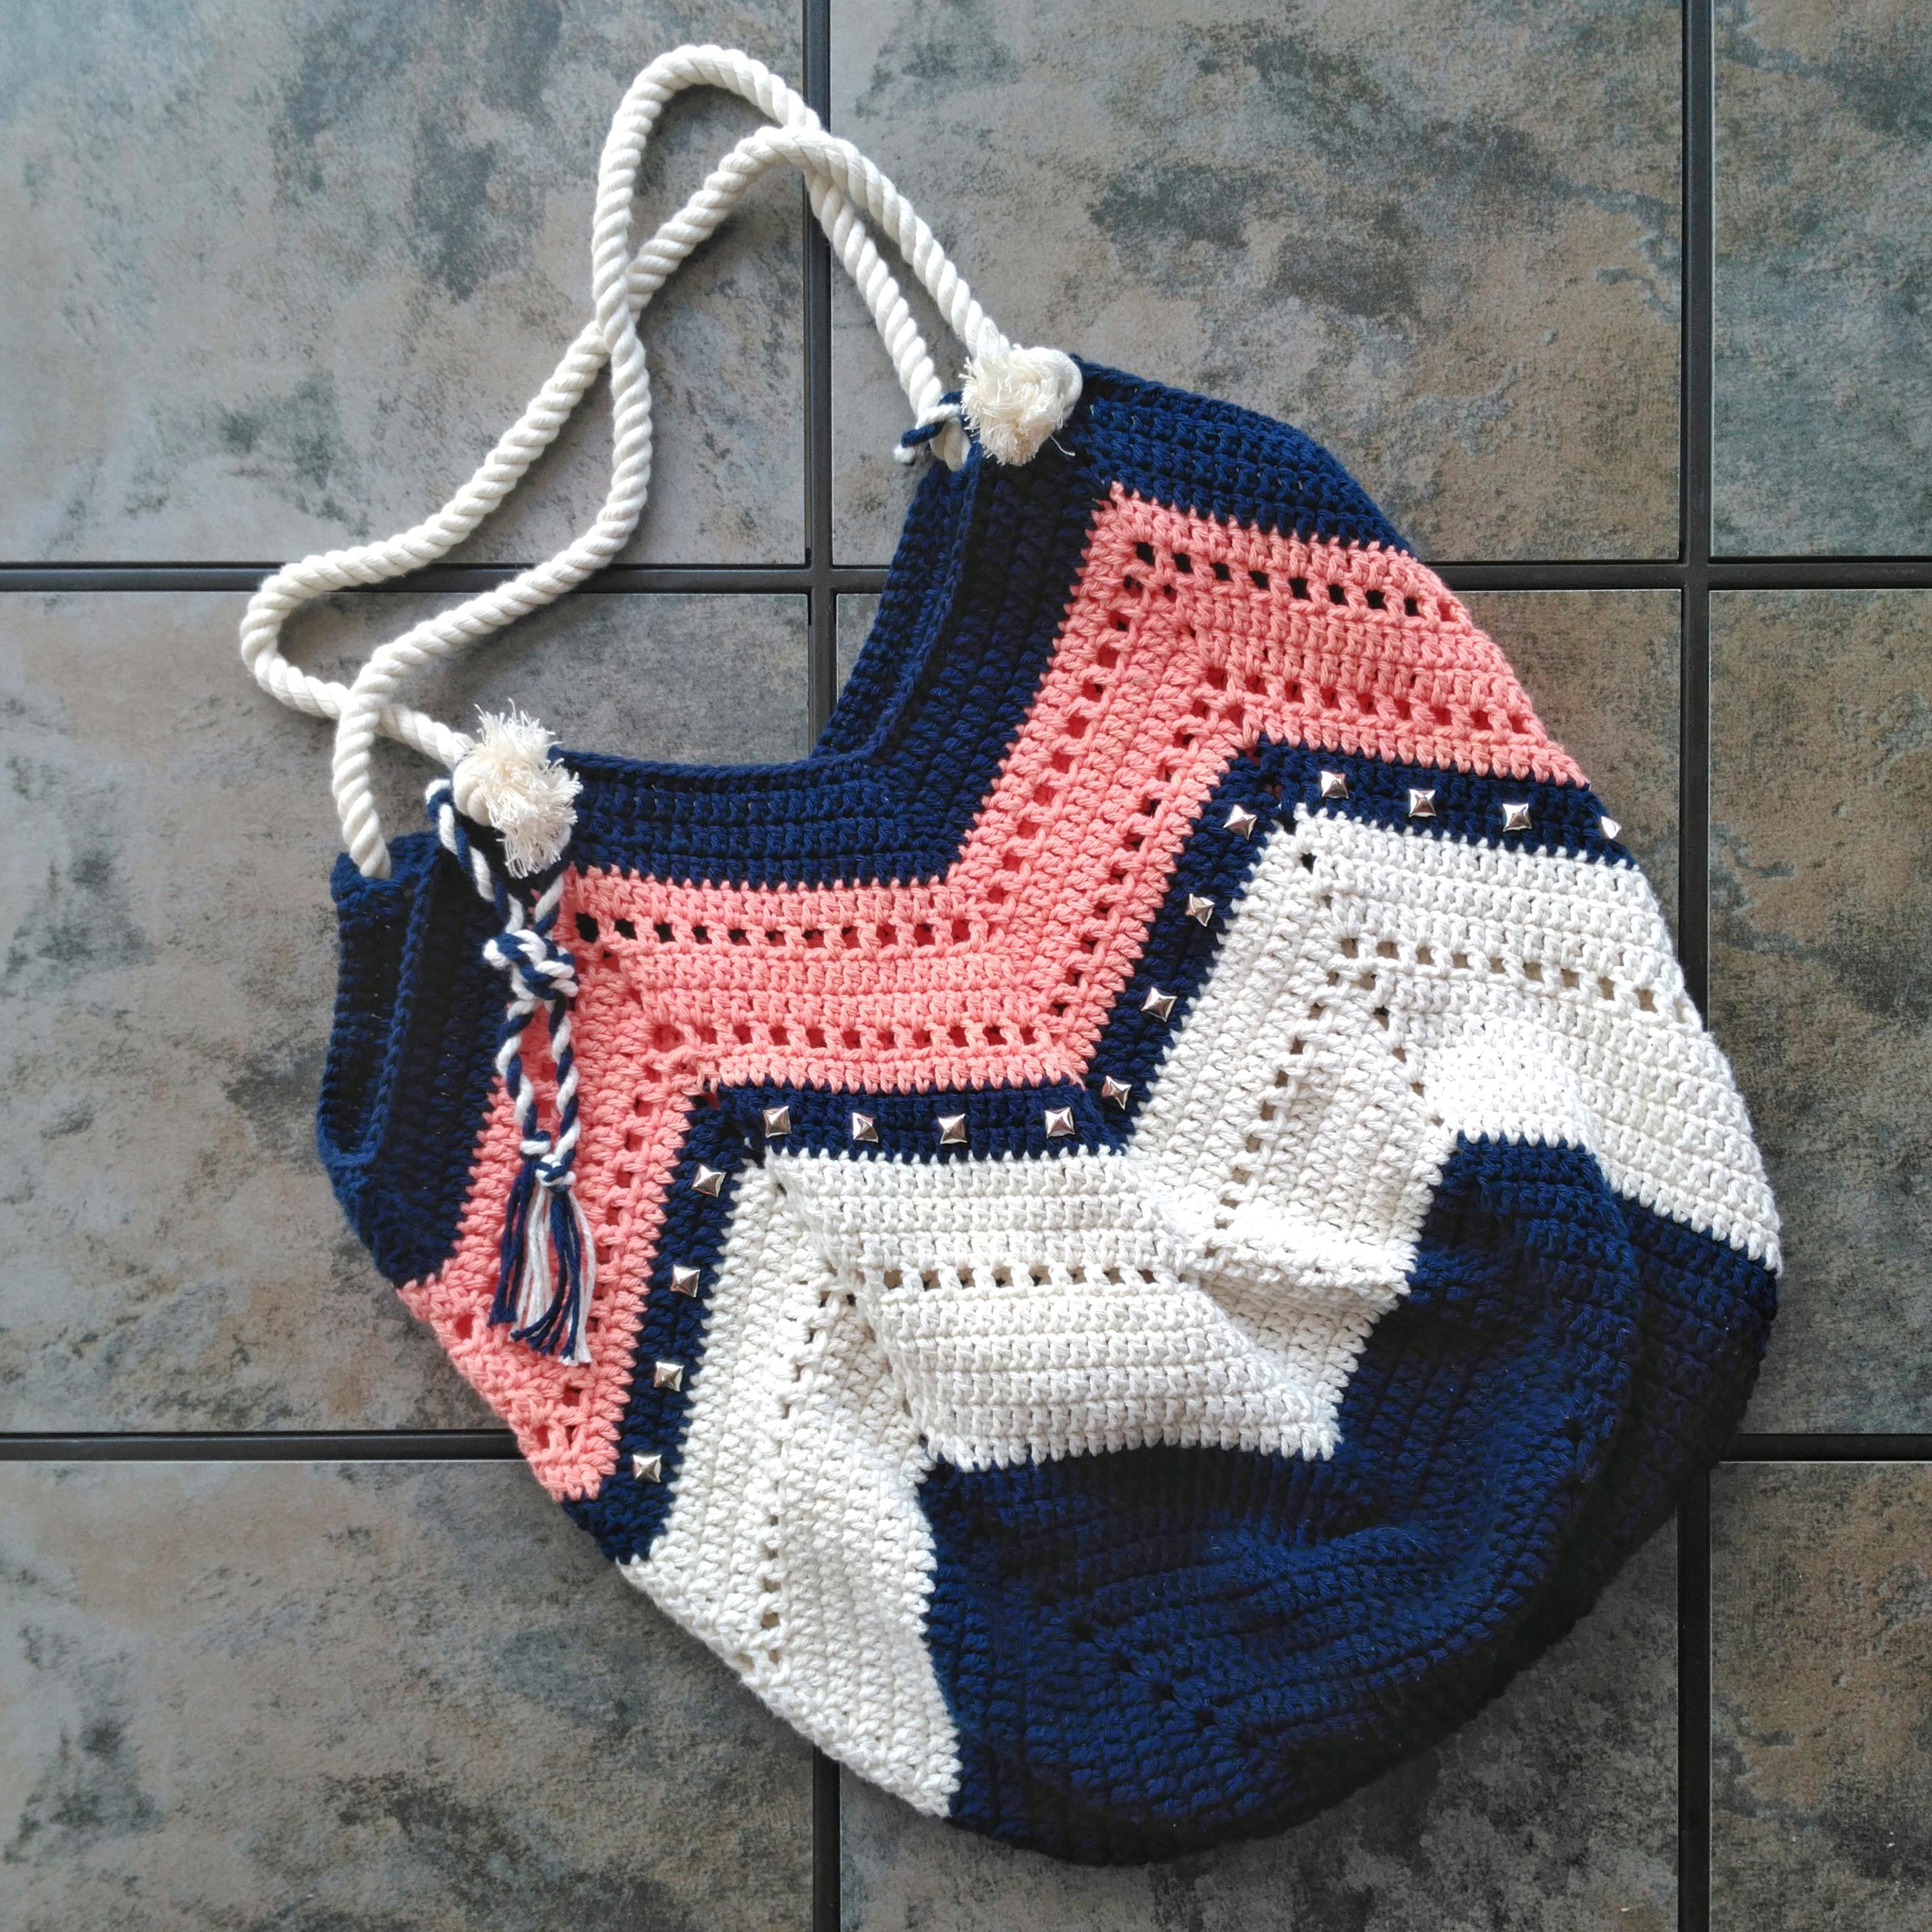 Sac Au Crochet Avec Explications Gratuites Mery Crochet